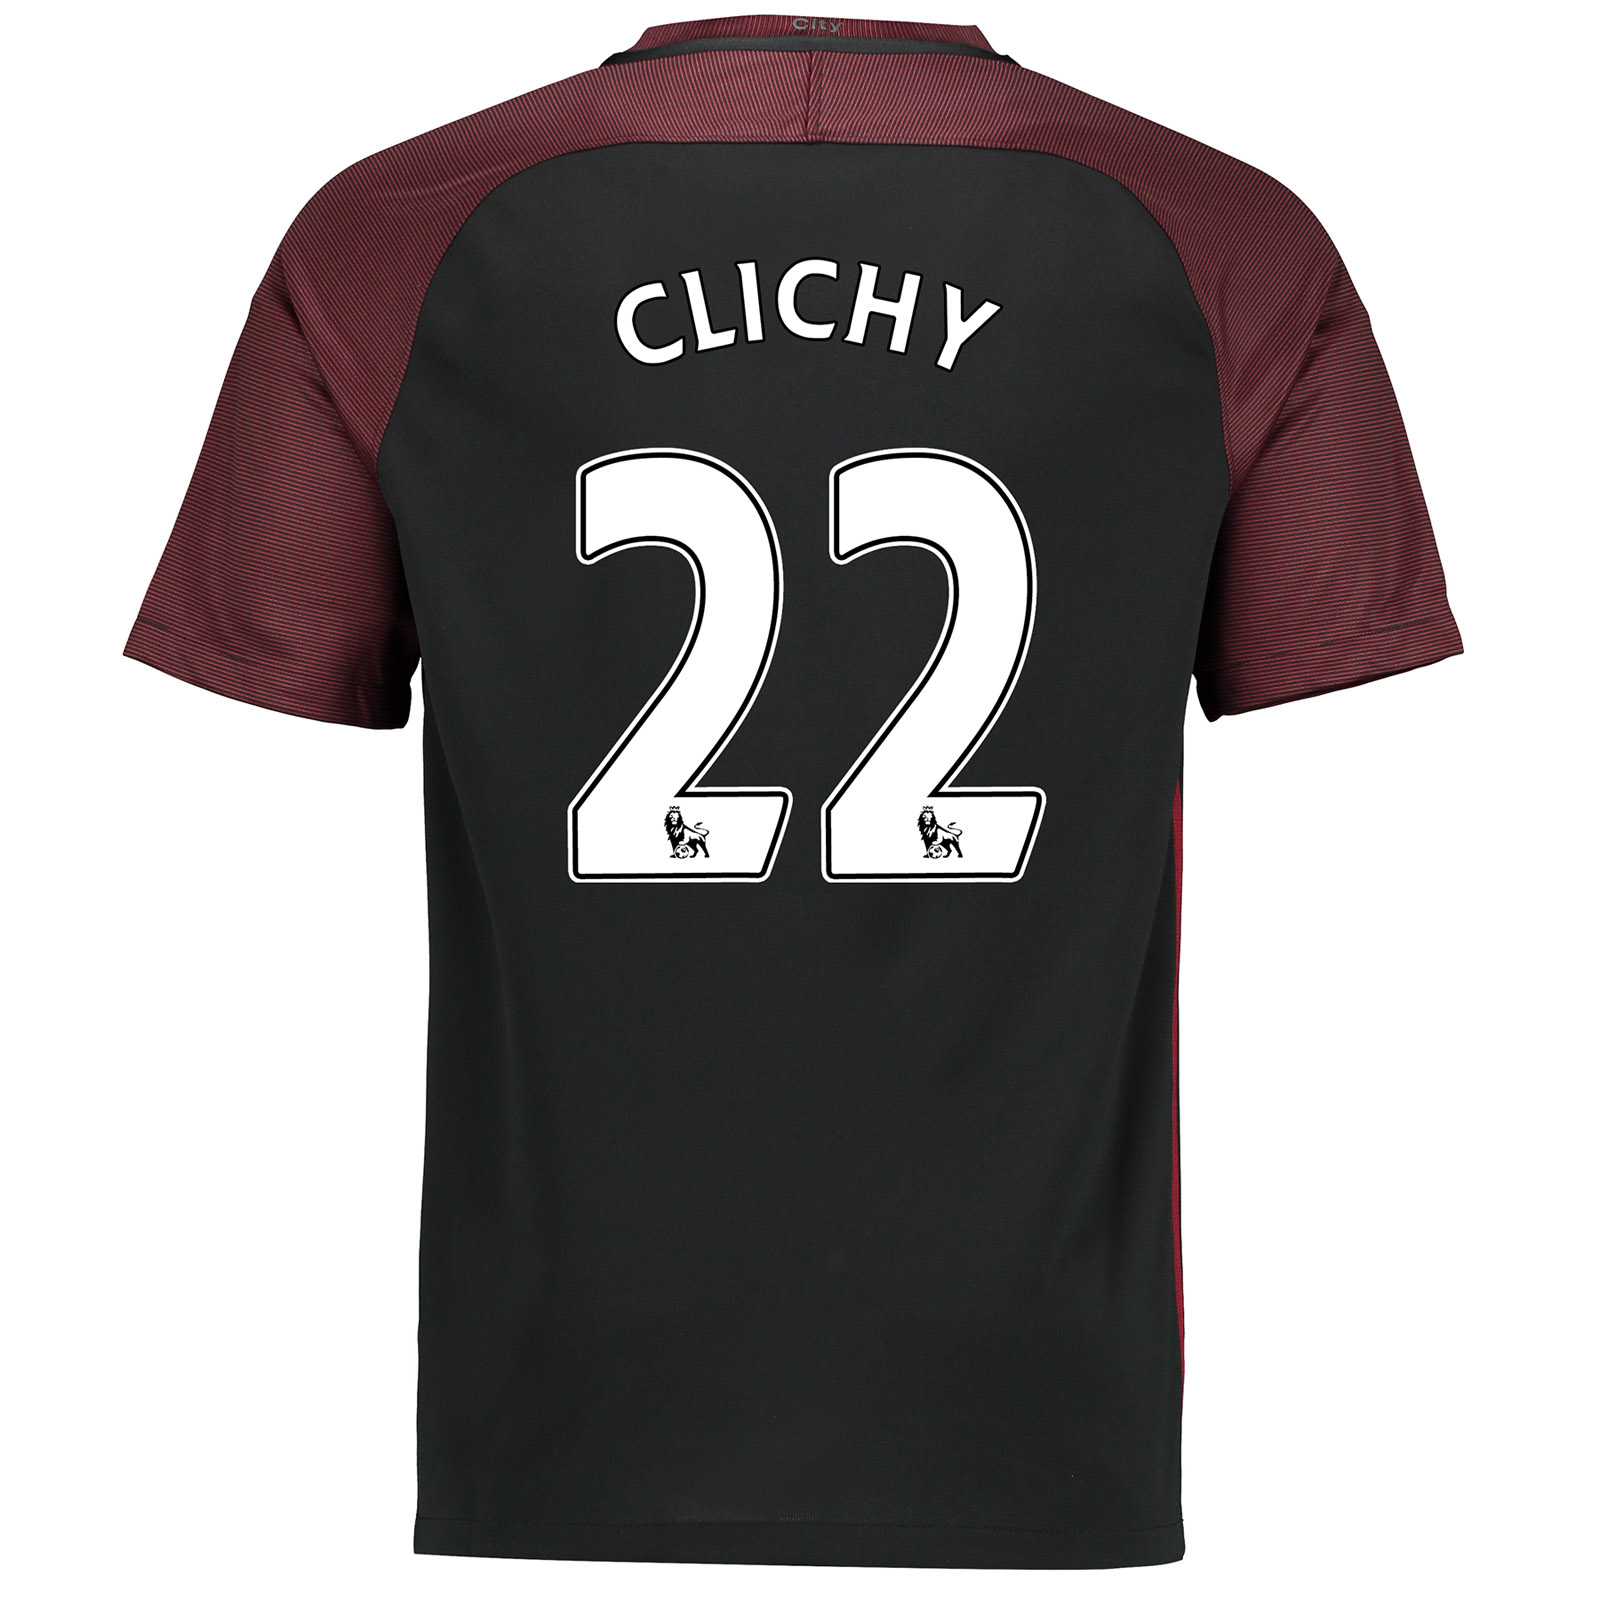 Manchester City Away Stadium Shirt 2016-17-Kids with Clichy 22 printin